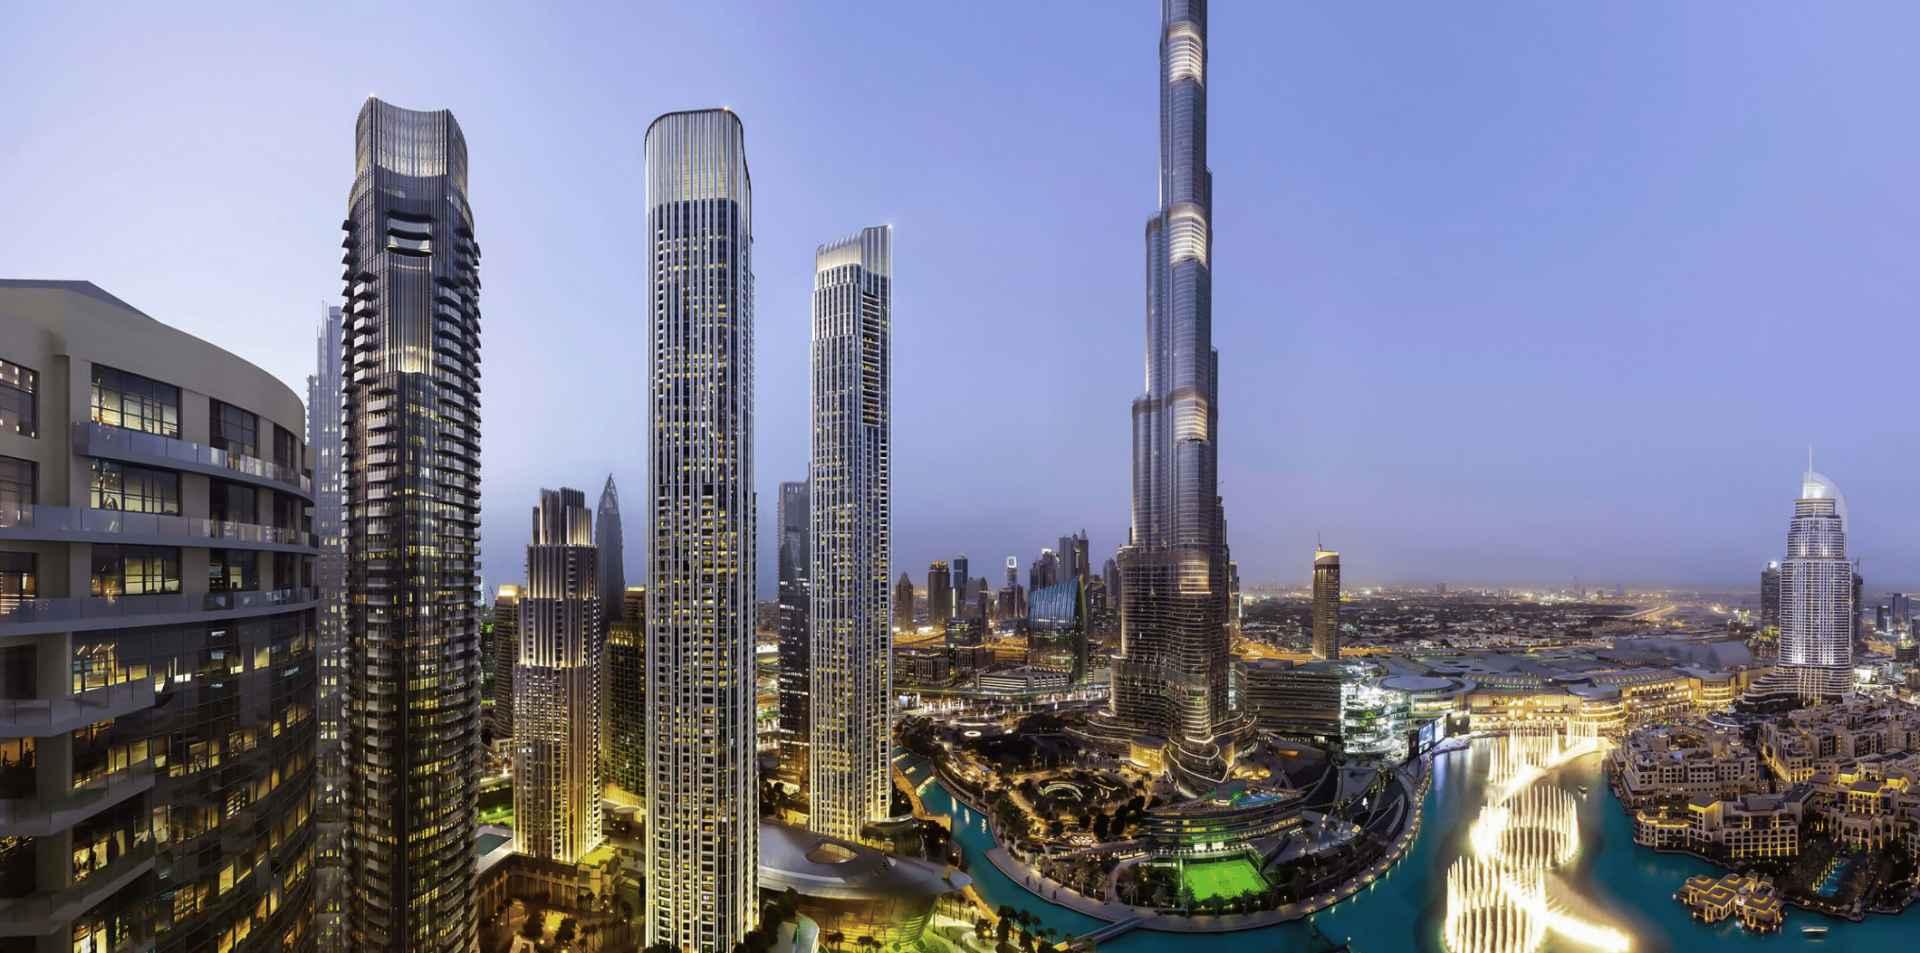 Luxury Property Dubai 4 Bedroom Penthouse for sale in IL Primo Downtown Dubai